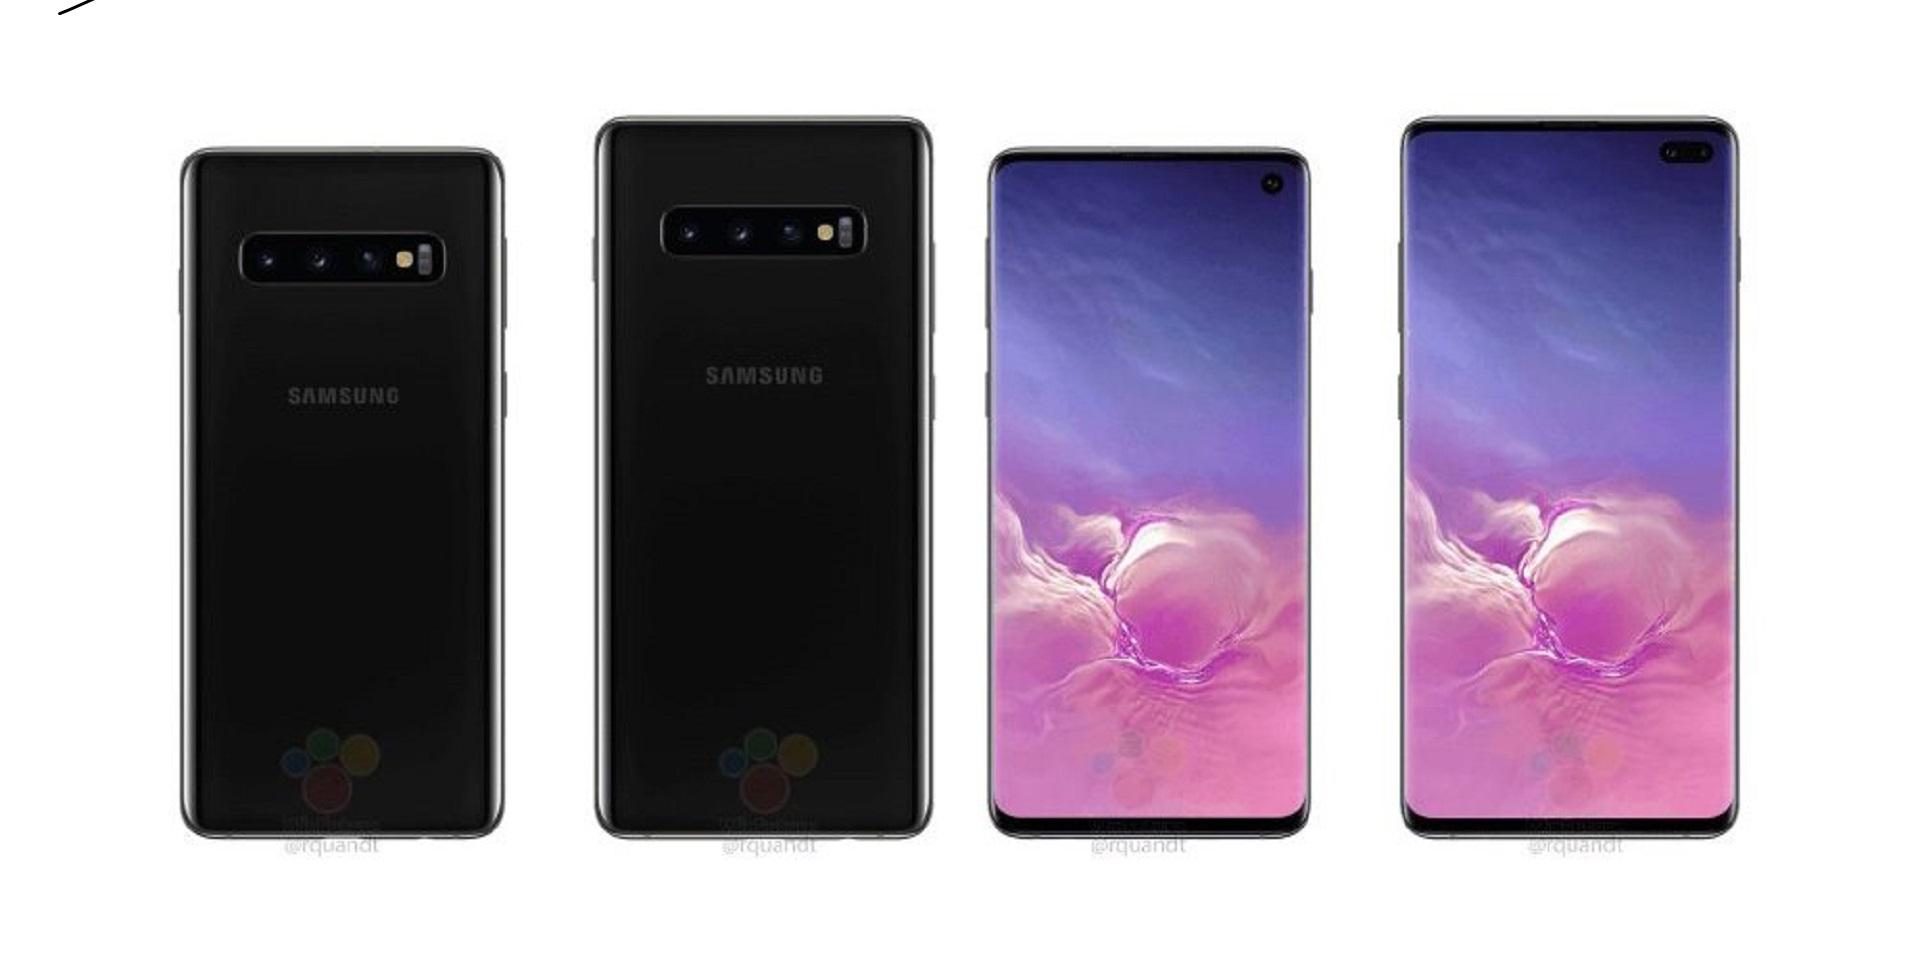 Galaxy S10 Geekbench